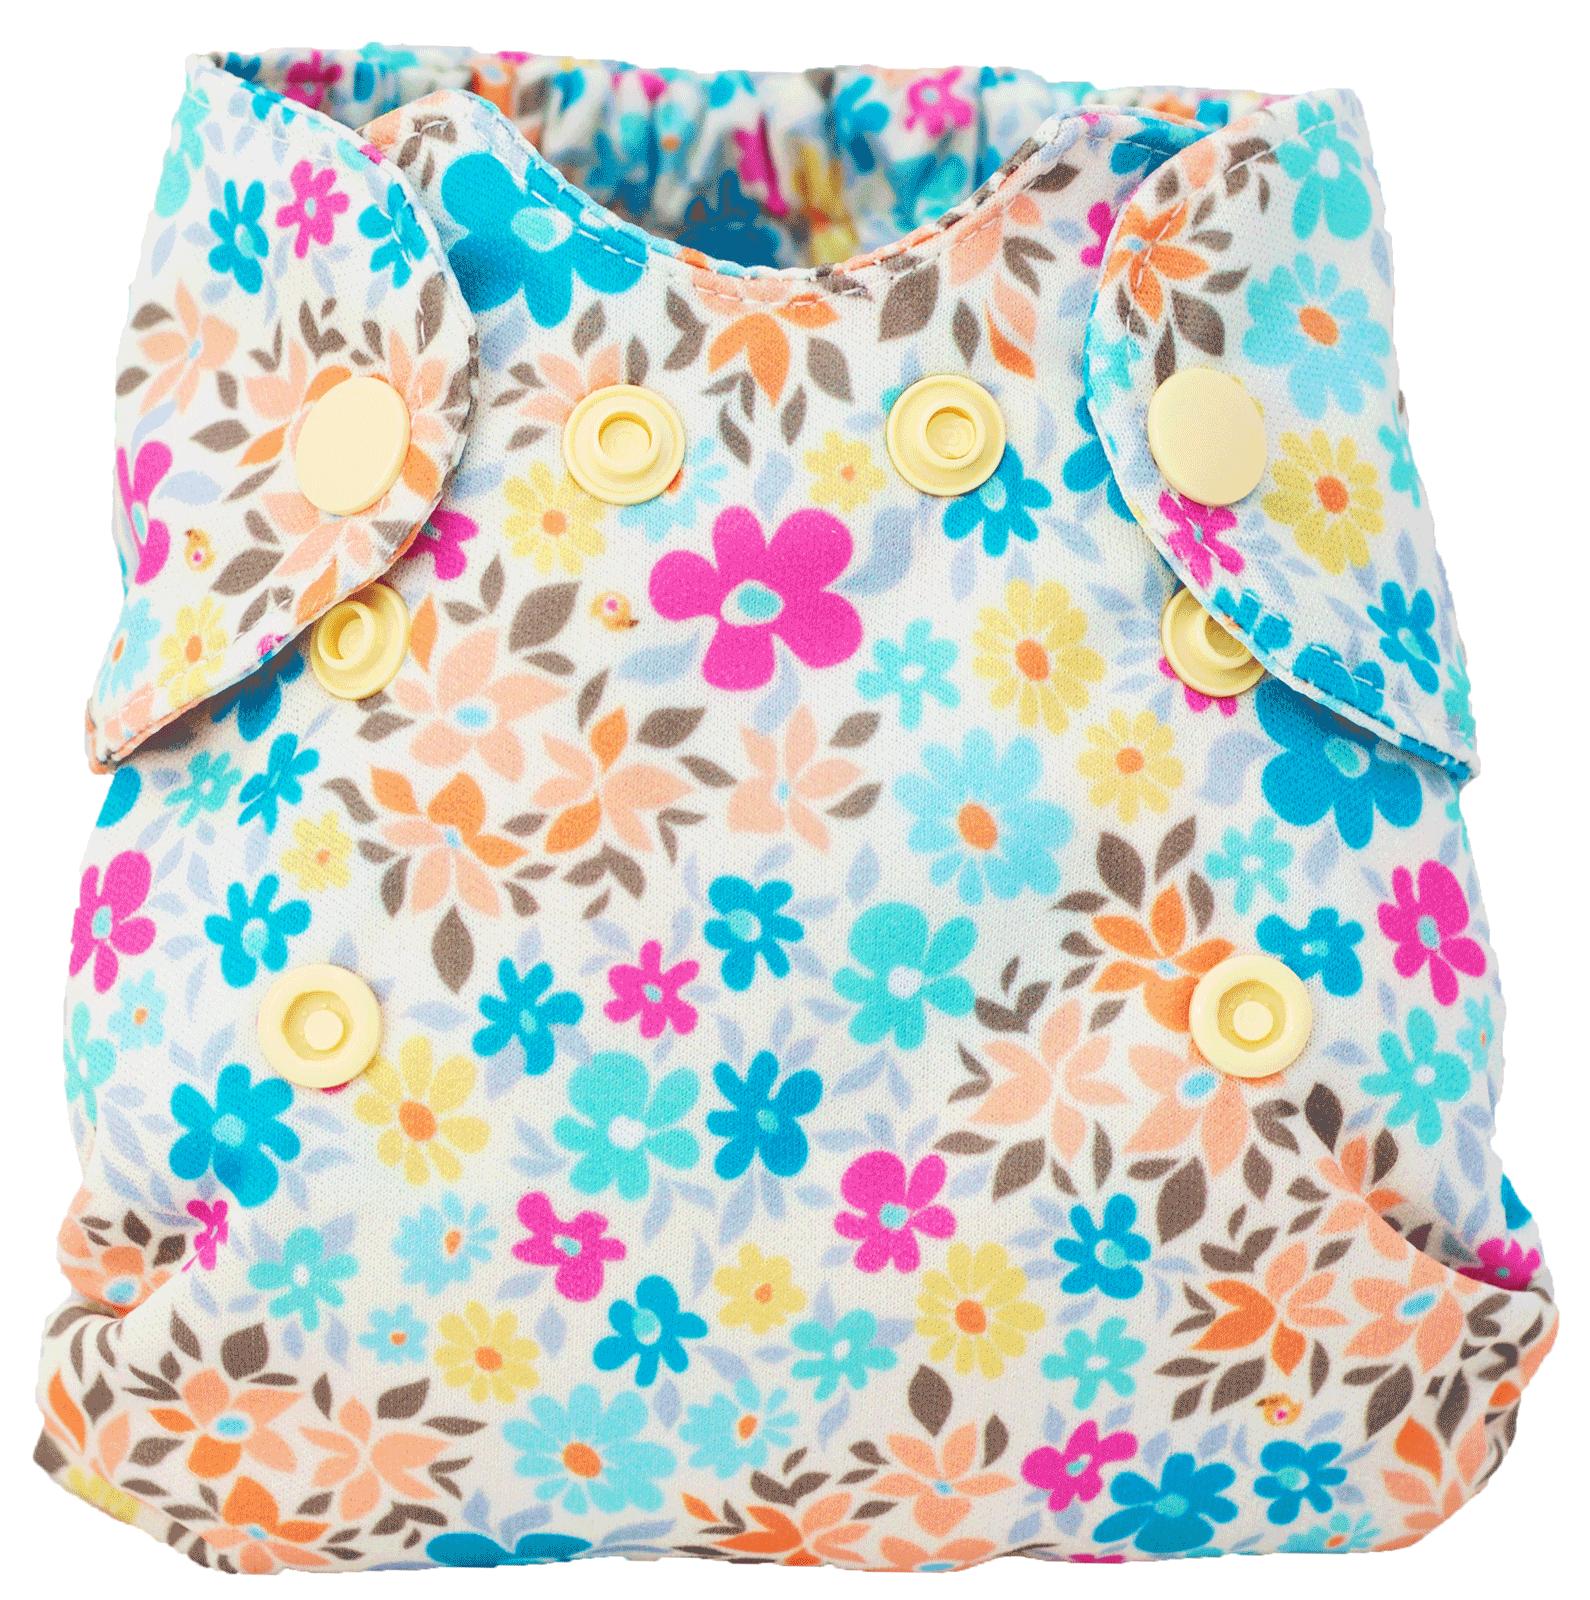 9f3cd6d4ab3 Smart Bottoms Born Smart Newborn All-in-One Cloth Diaper - Smart ...